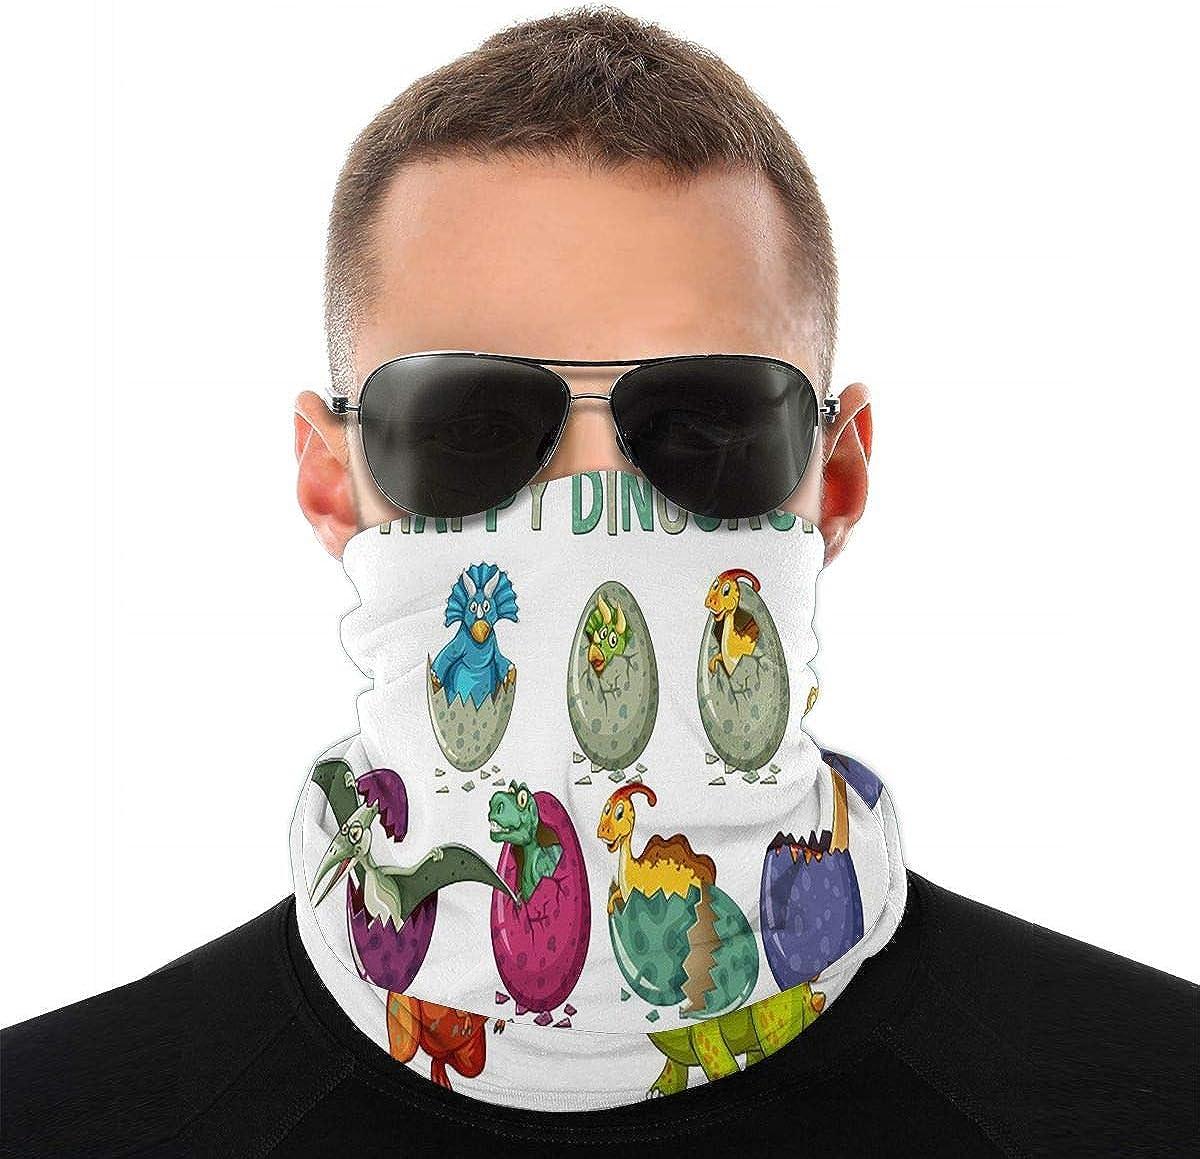 KiuLoam Happy Dinosaur Seamless Face Mask Bandanas Neck Gaiter for Men and Women, Multifunction Headband Scarf for Dust, Outdoors, Sports